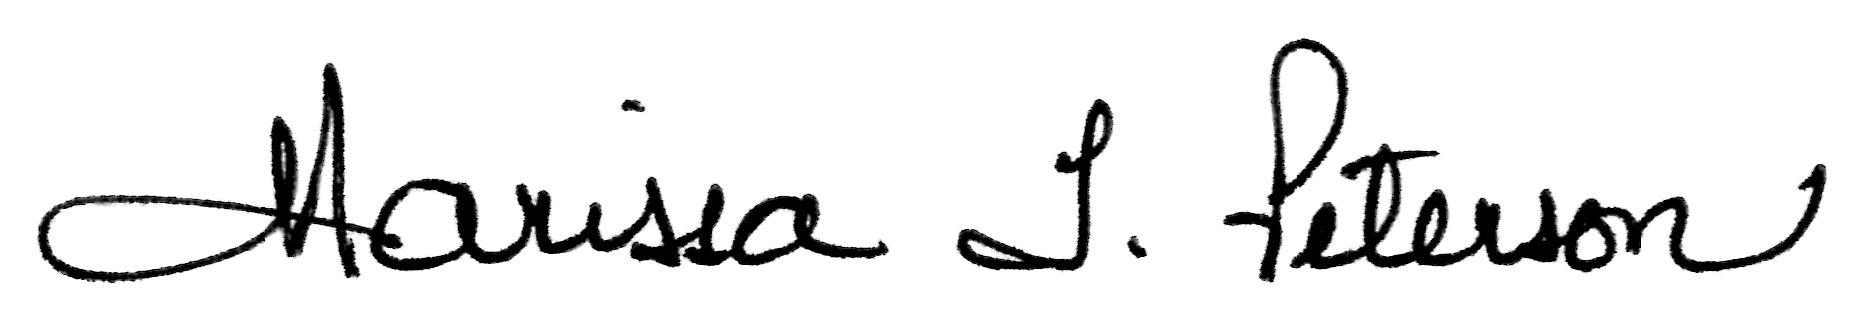 MARISSASIGNATUREA03.JPG